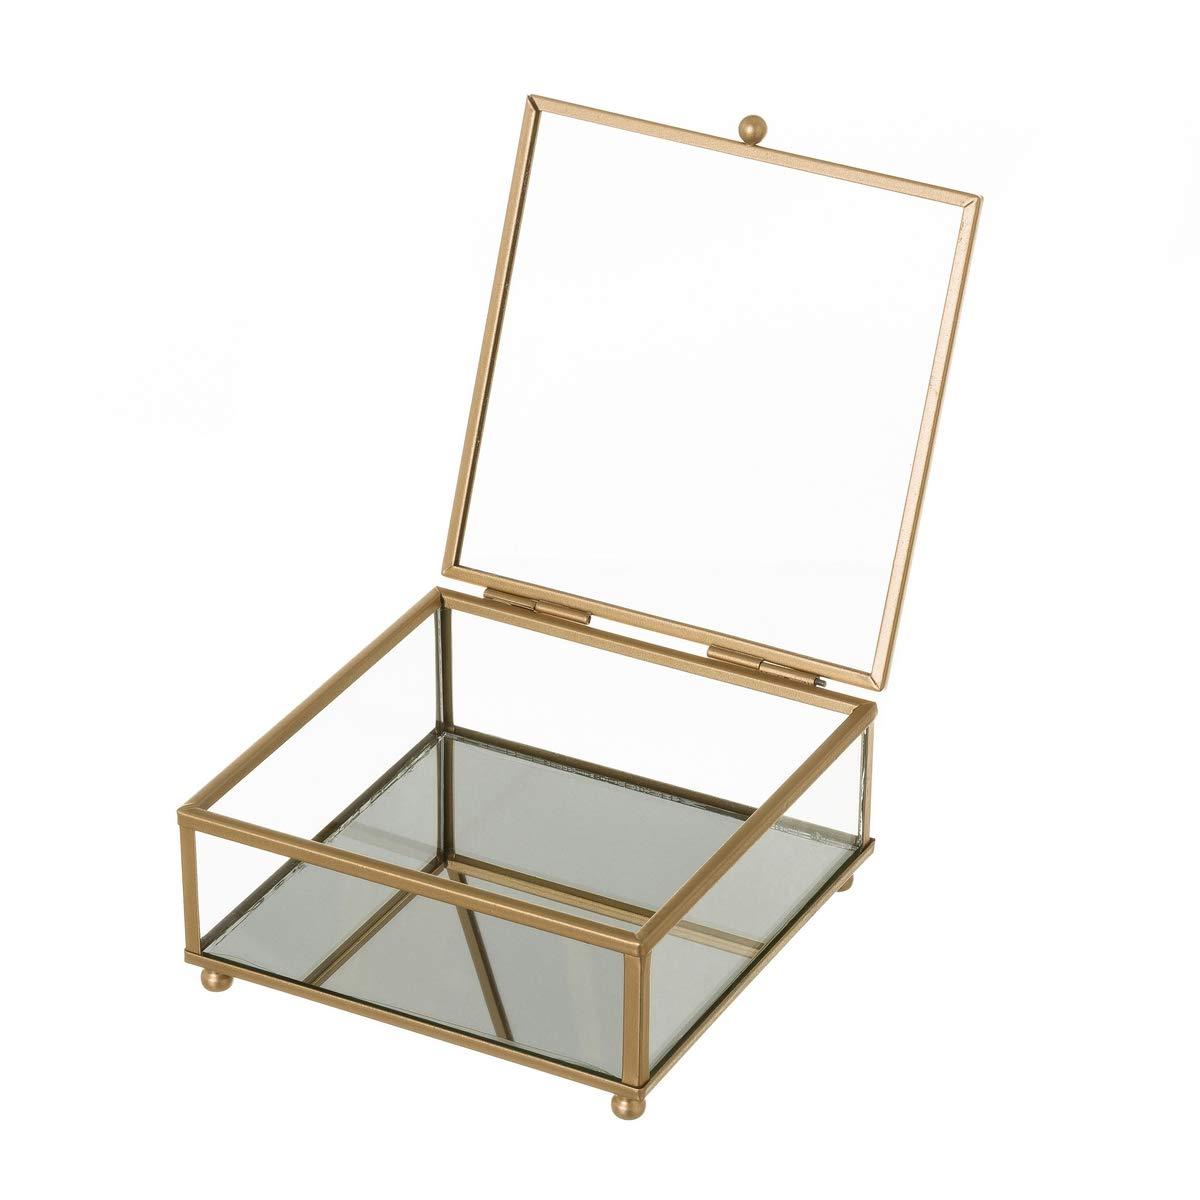 Joyero Caja de Cristal y Metal Dorada clásica, de 13x14x6 cm ...